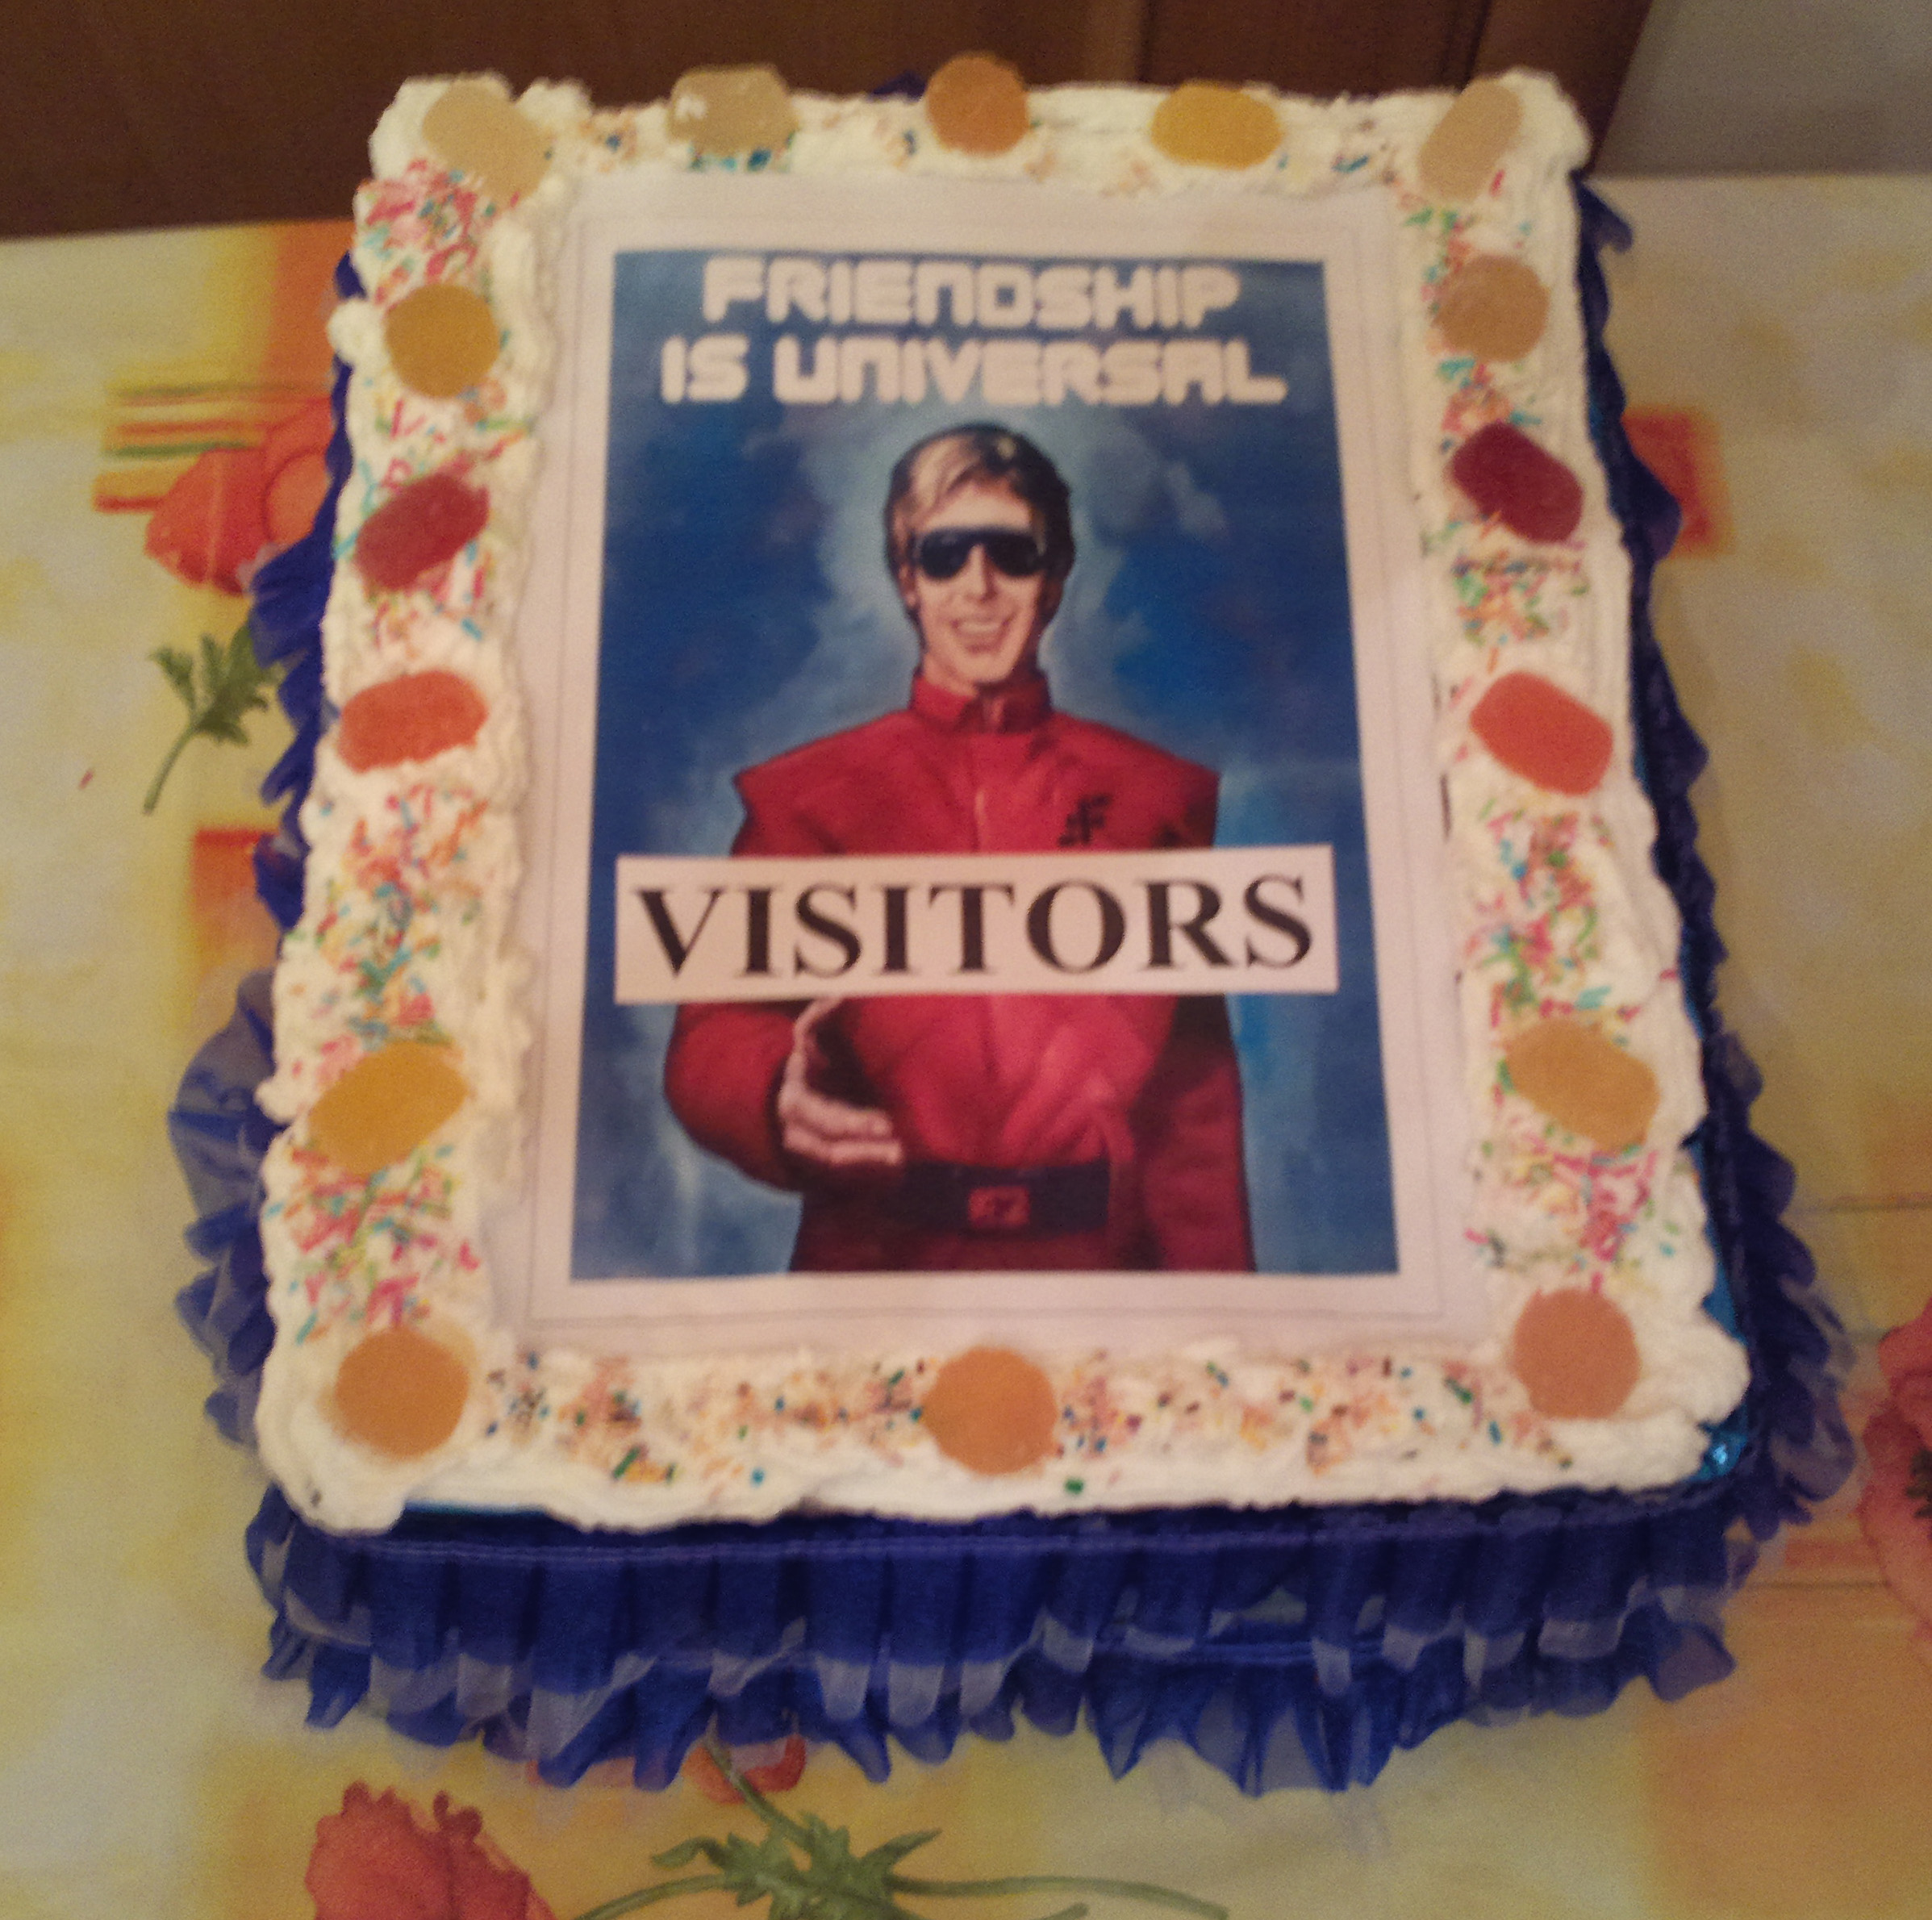 cake_v-visitors-A